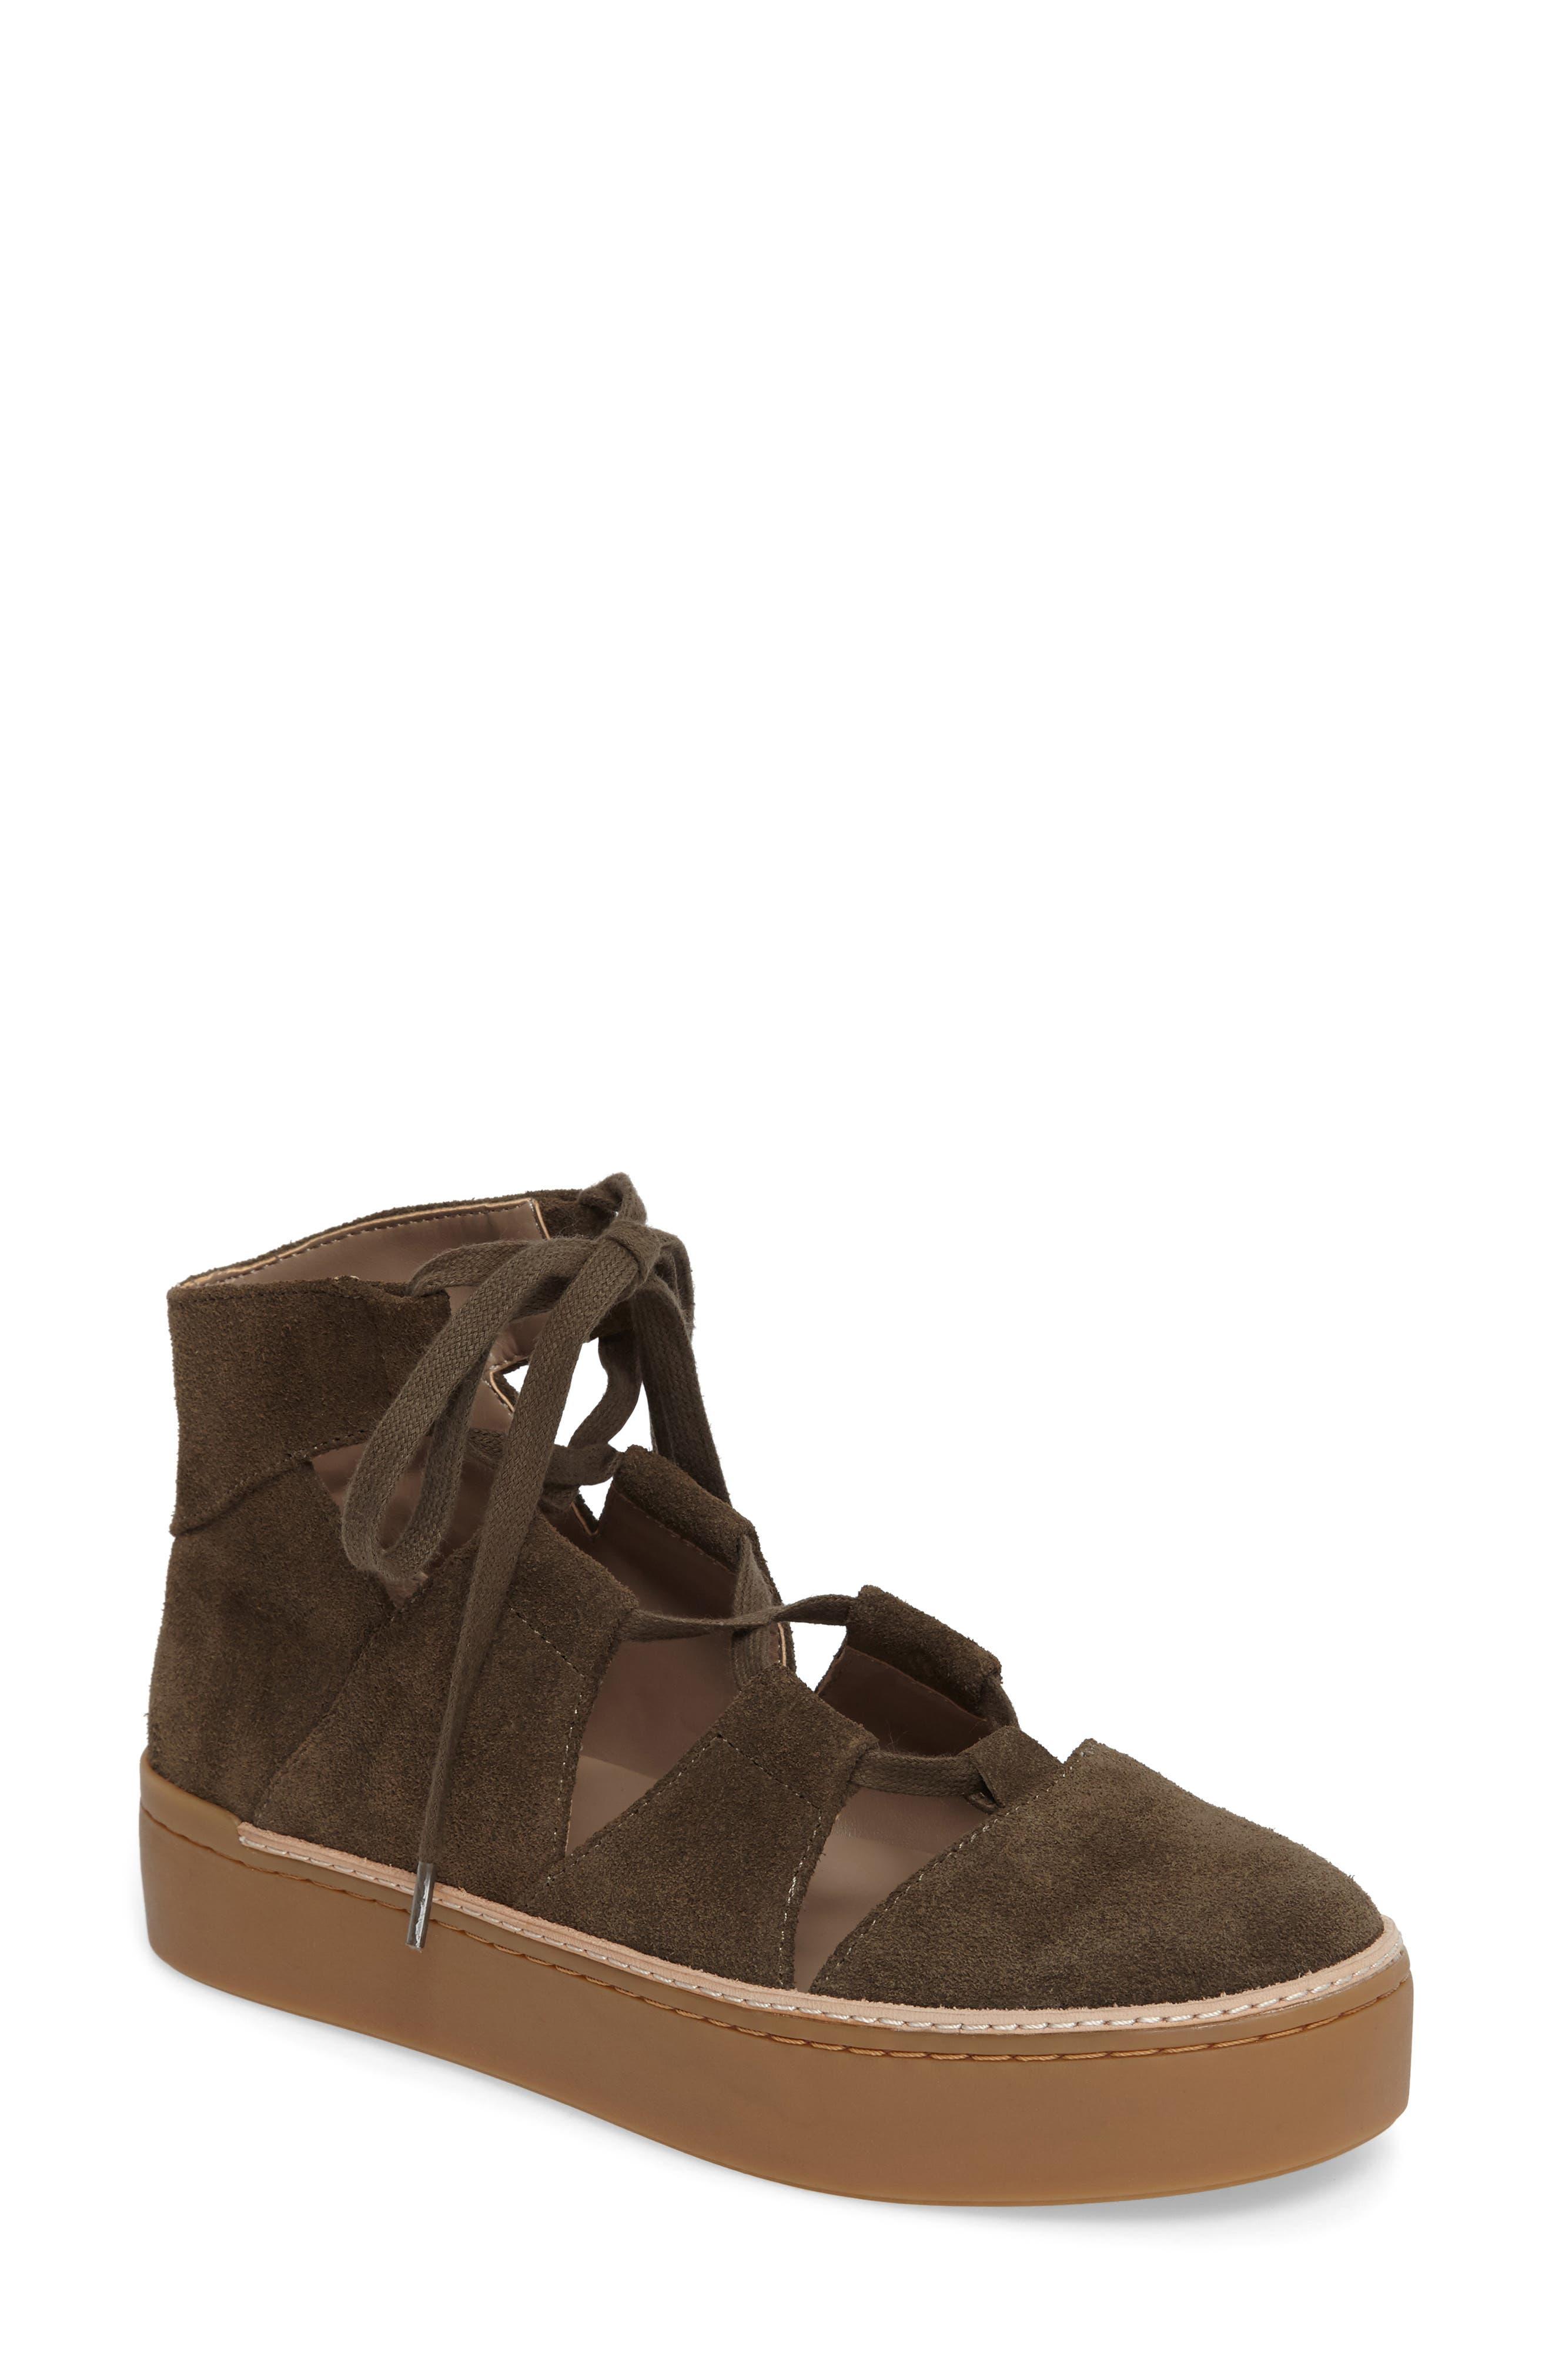 Main Image - M4D3 Savanah Ghillie Platform Sneaker (Women)